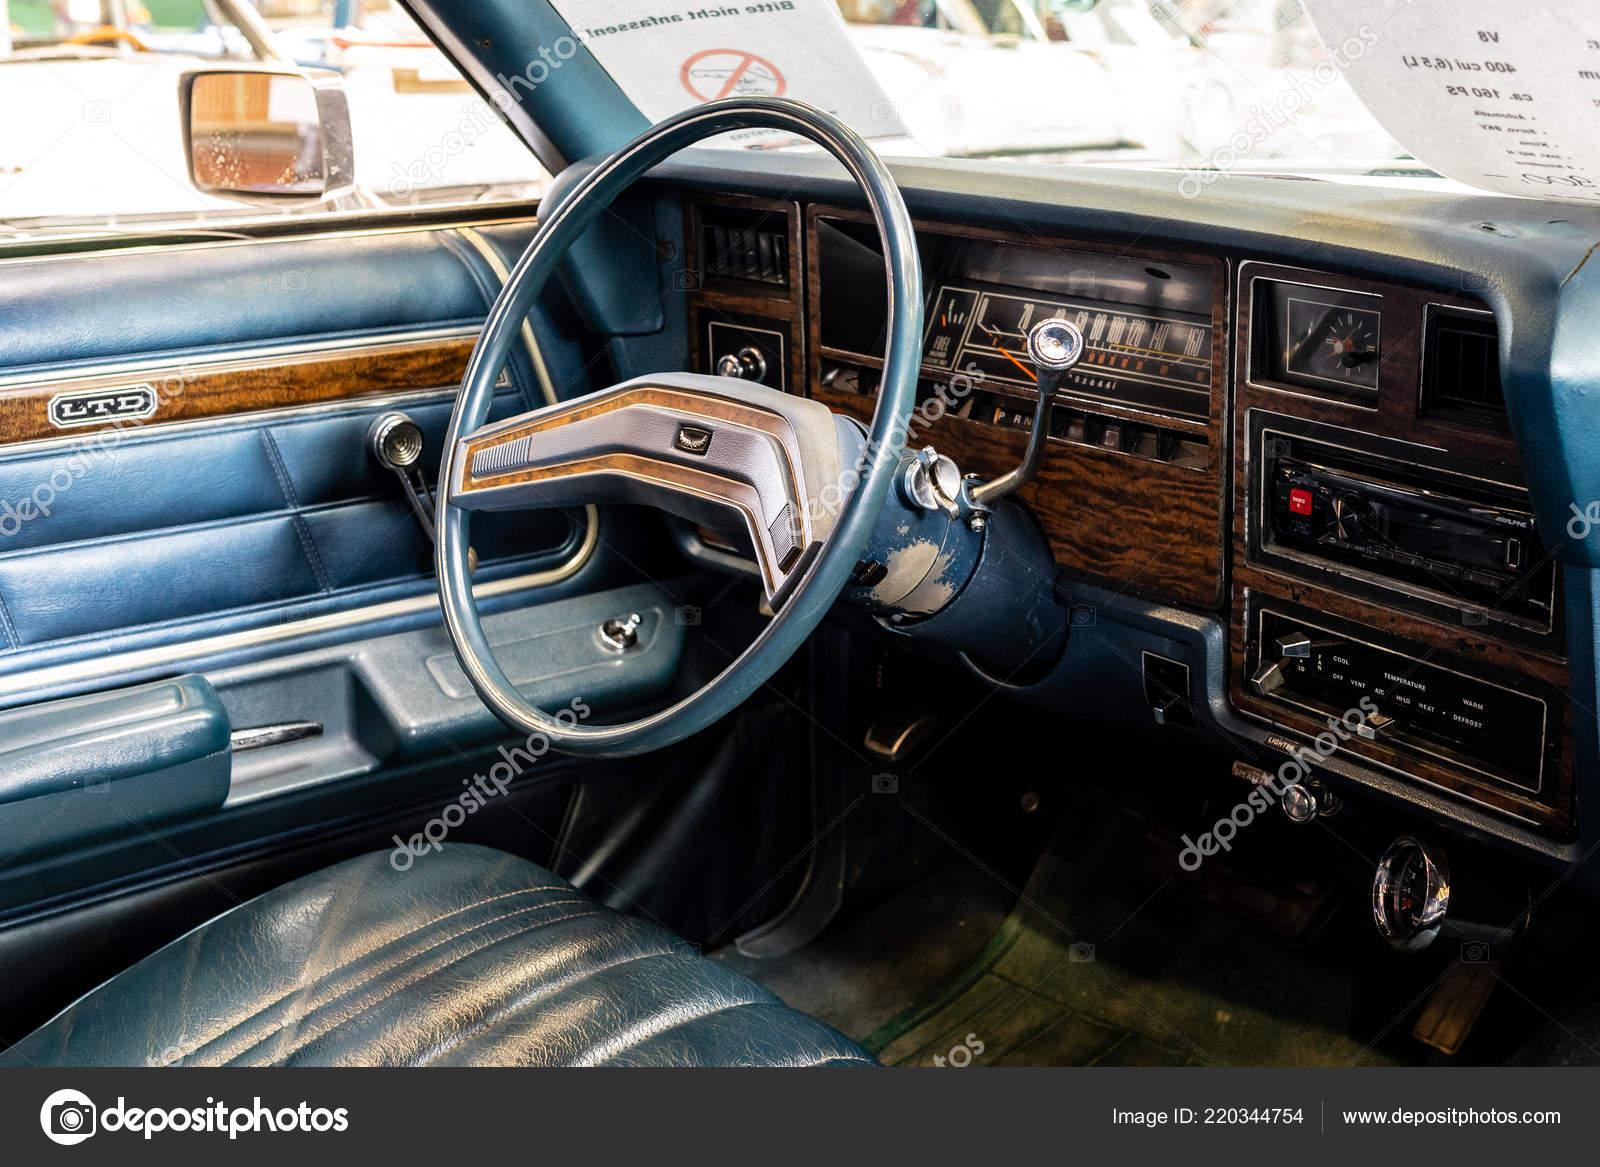 f32c2347d0f Paaren Im Glien, Γερμανία - 19 Μαΐου 2018: Εσωτερικό του πλήρους μεγέθους  αυτοκίνητο Ford Ltd στέισον βάγκον, 1975. Πεθαίνουν Oldtimer εμφάνιση 2018  ...